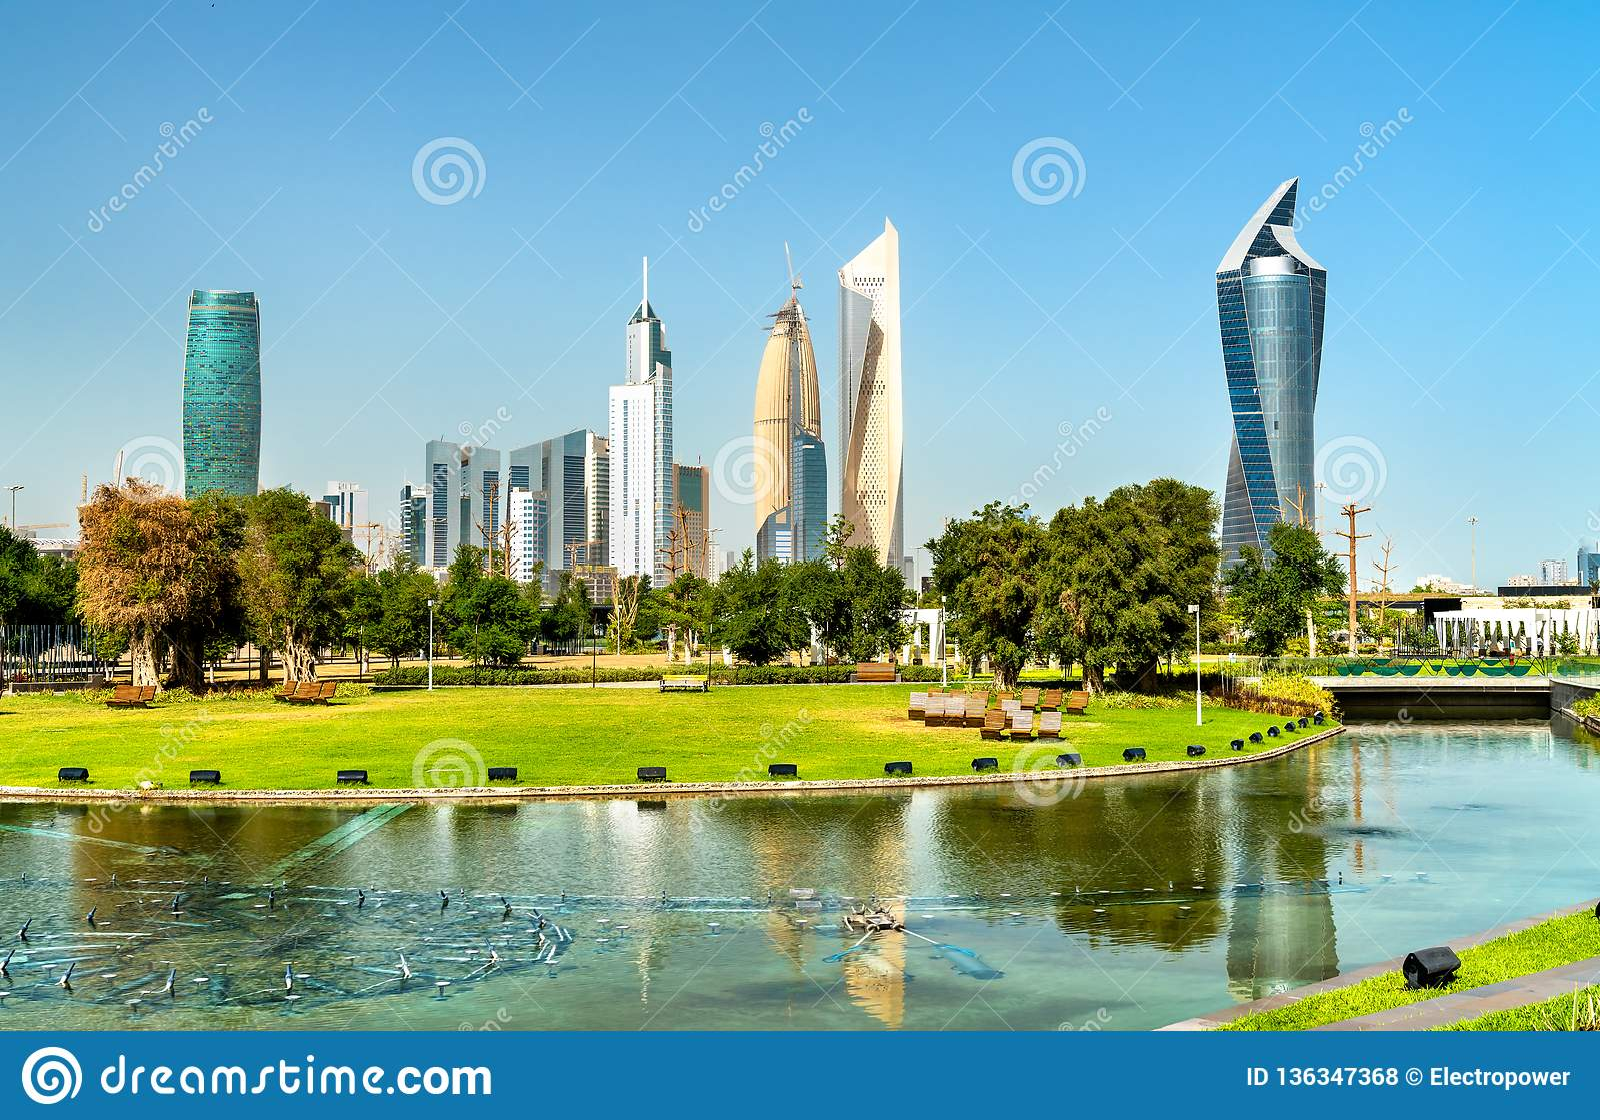 Skyline Of Kuwait City At Al Shaheed Park Stock Photo